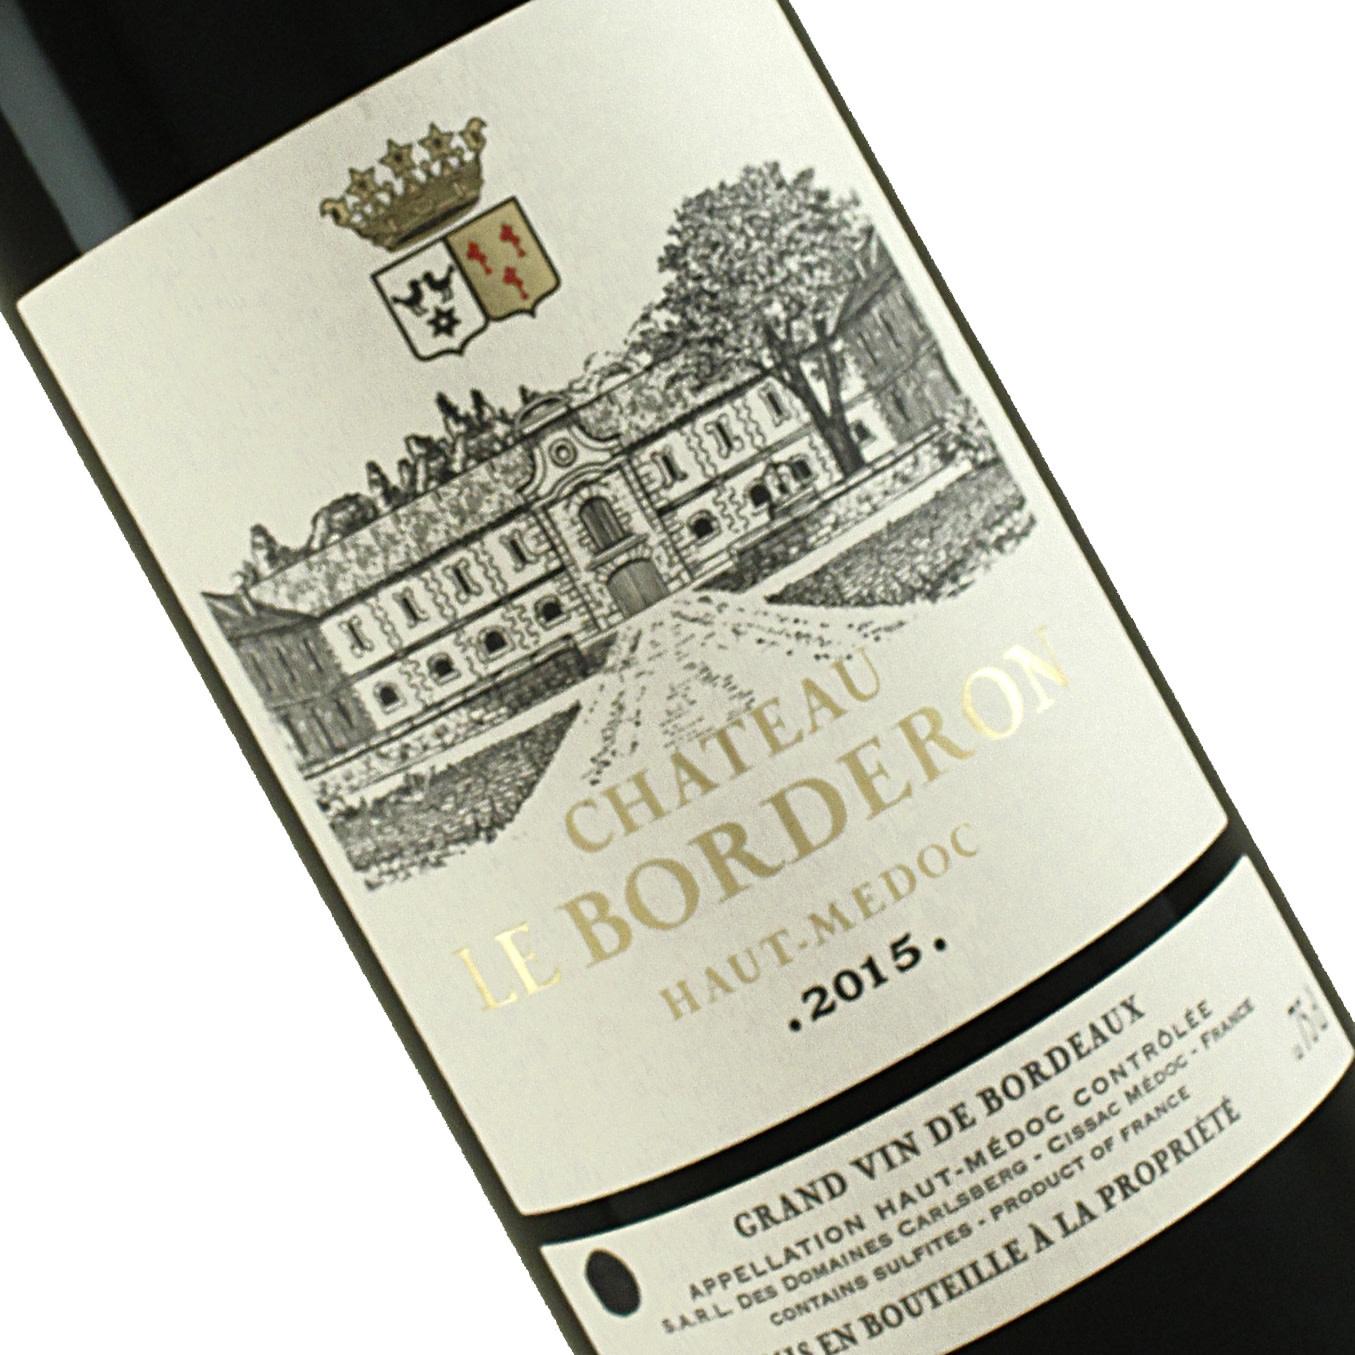 Chateau Le Borderon 2015 Haut Medoc Bordeaux